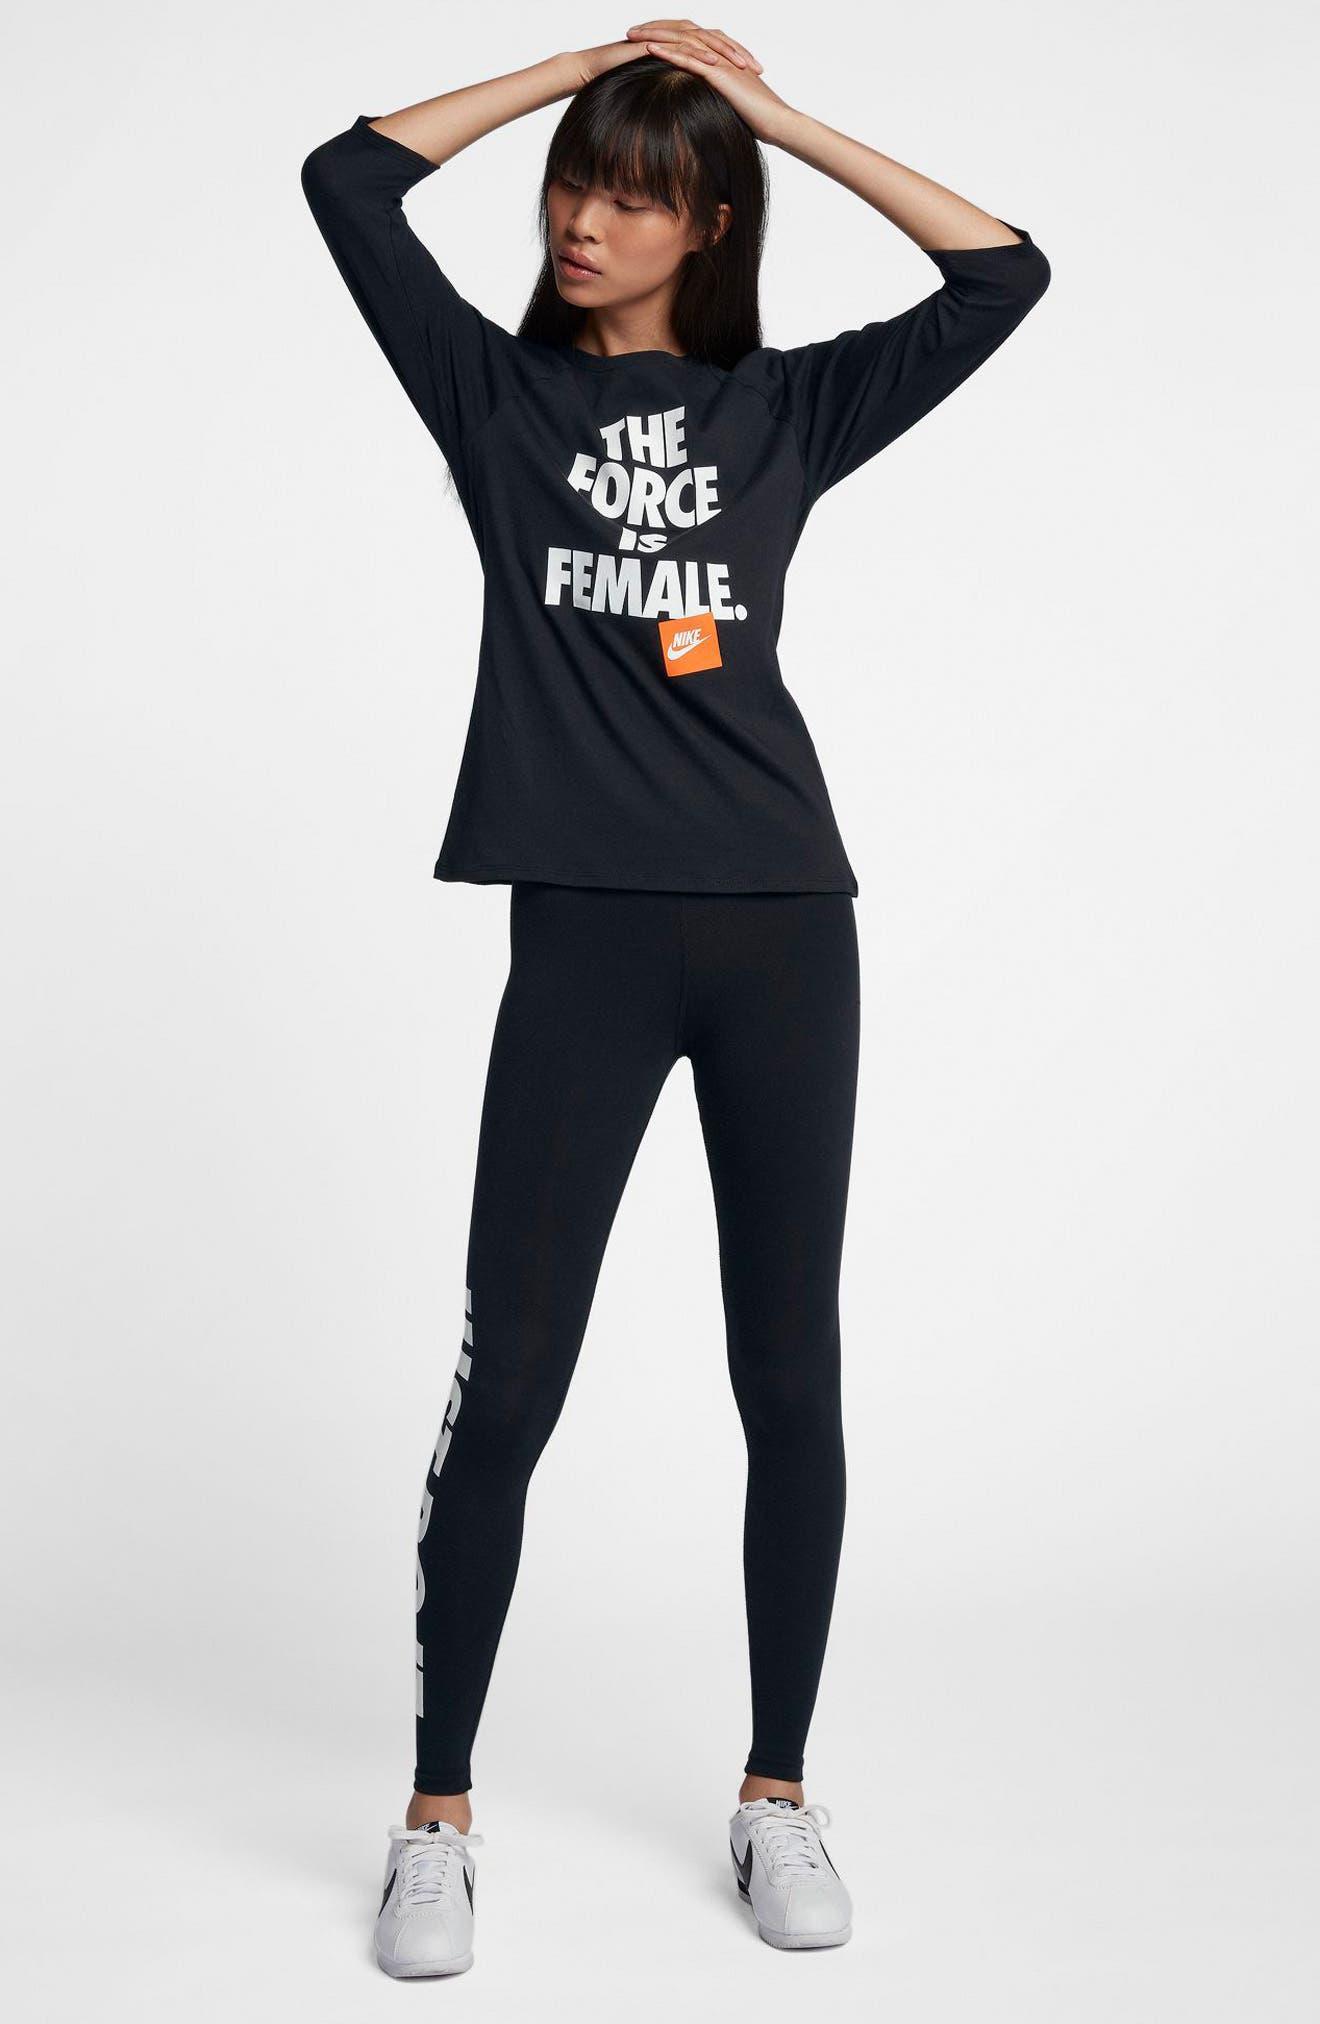 Sportswear The Force Is Female Raglan Tee,                             Alternate thumbnail 3, color,                             Black/ Black/ White